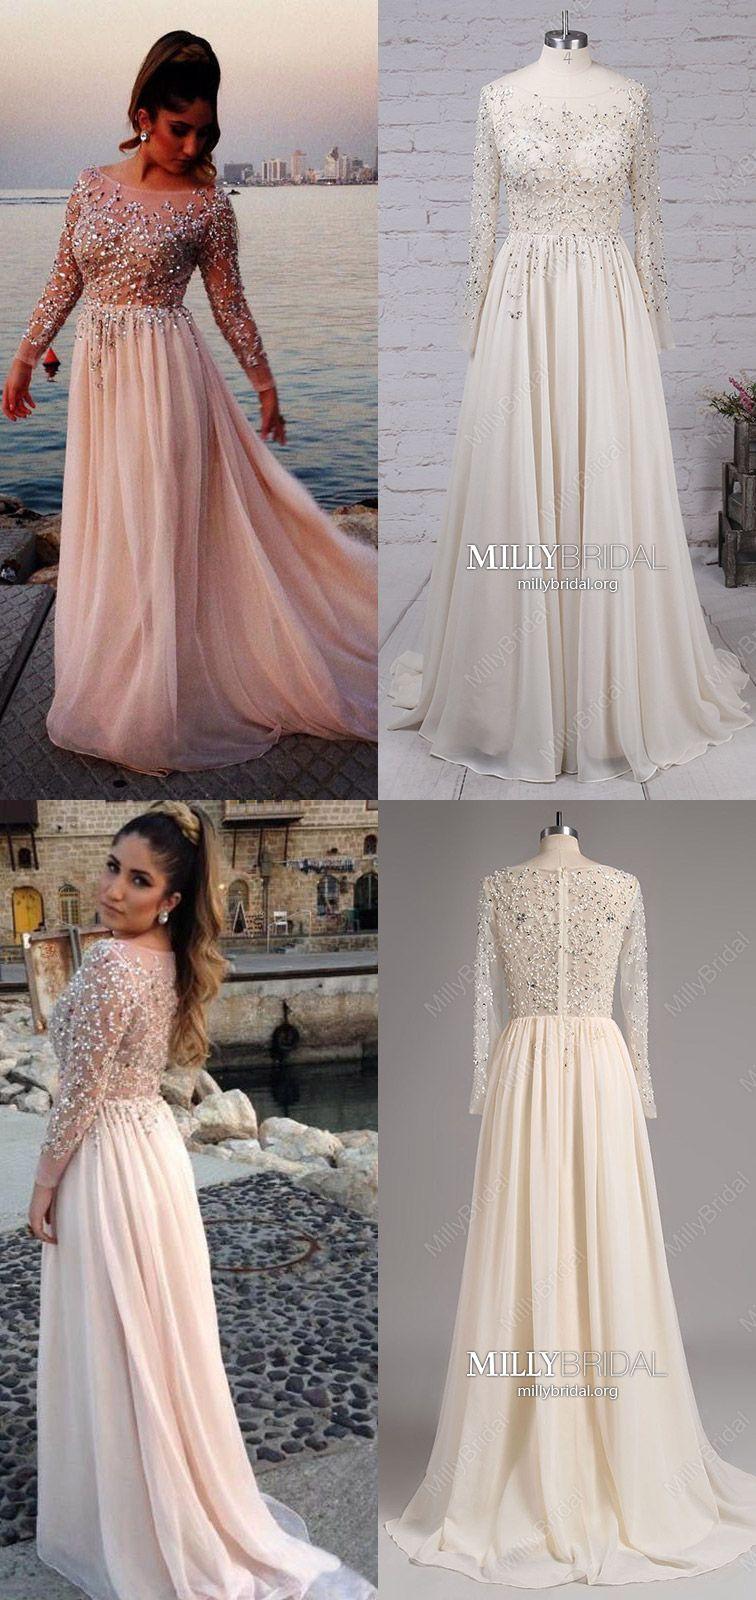 Pearl pink prom dresses for teenslong prom dresses alinechiffon